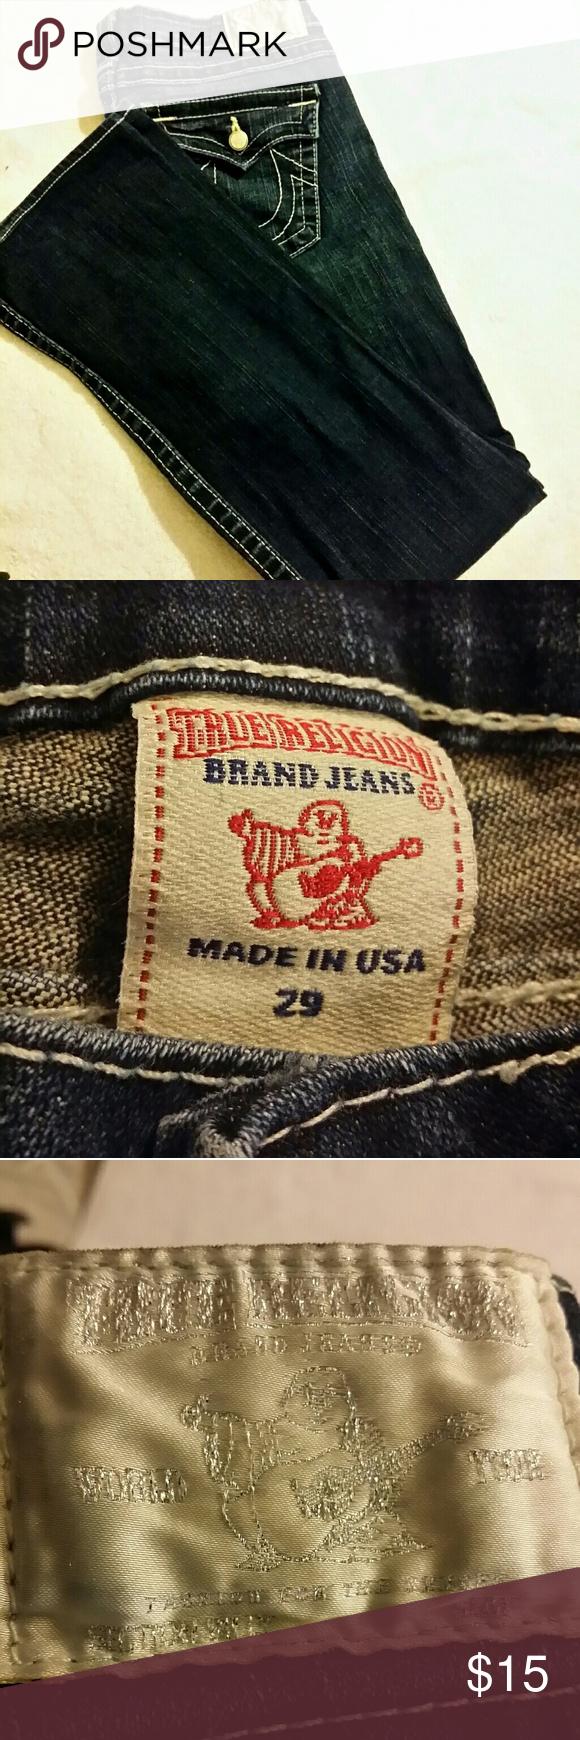 "TRUE RELIGION JEANS - 98% Cotton 2% Spandex Inseam 32"" Long Skinny Straight Size 29 True Religion Jeans Skinny"